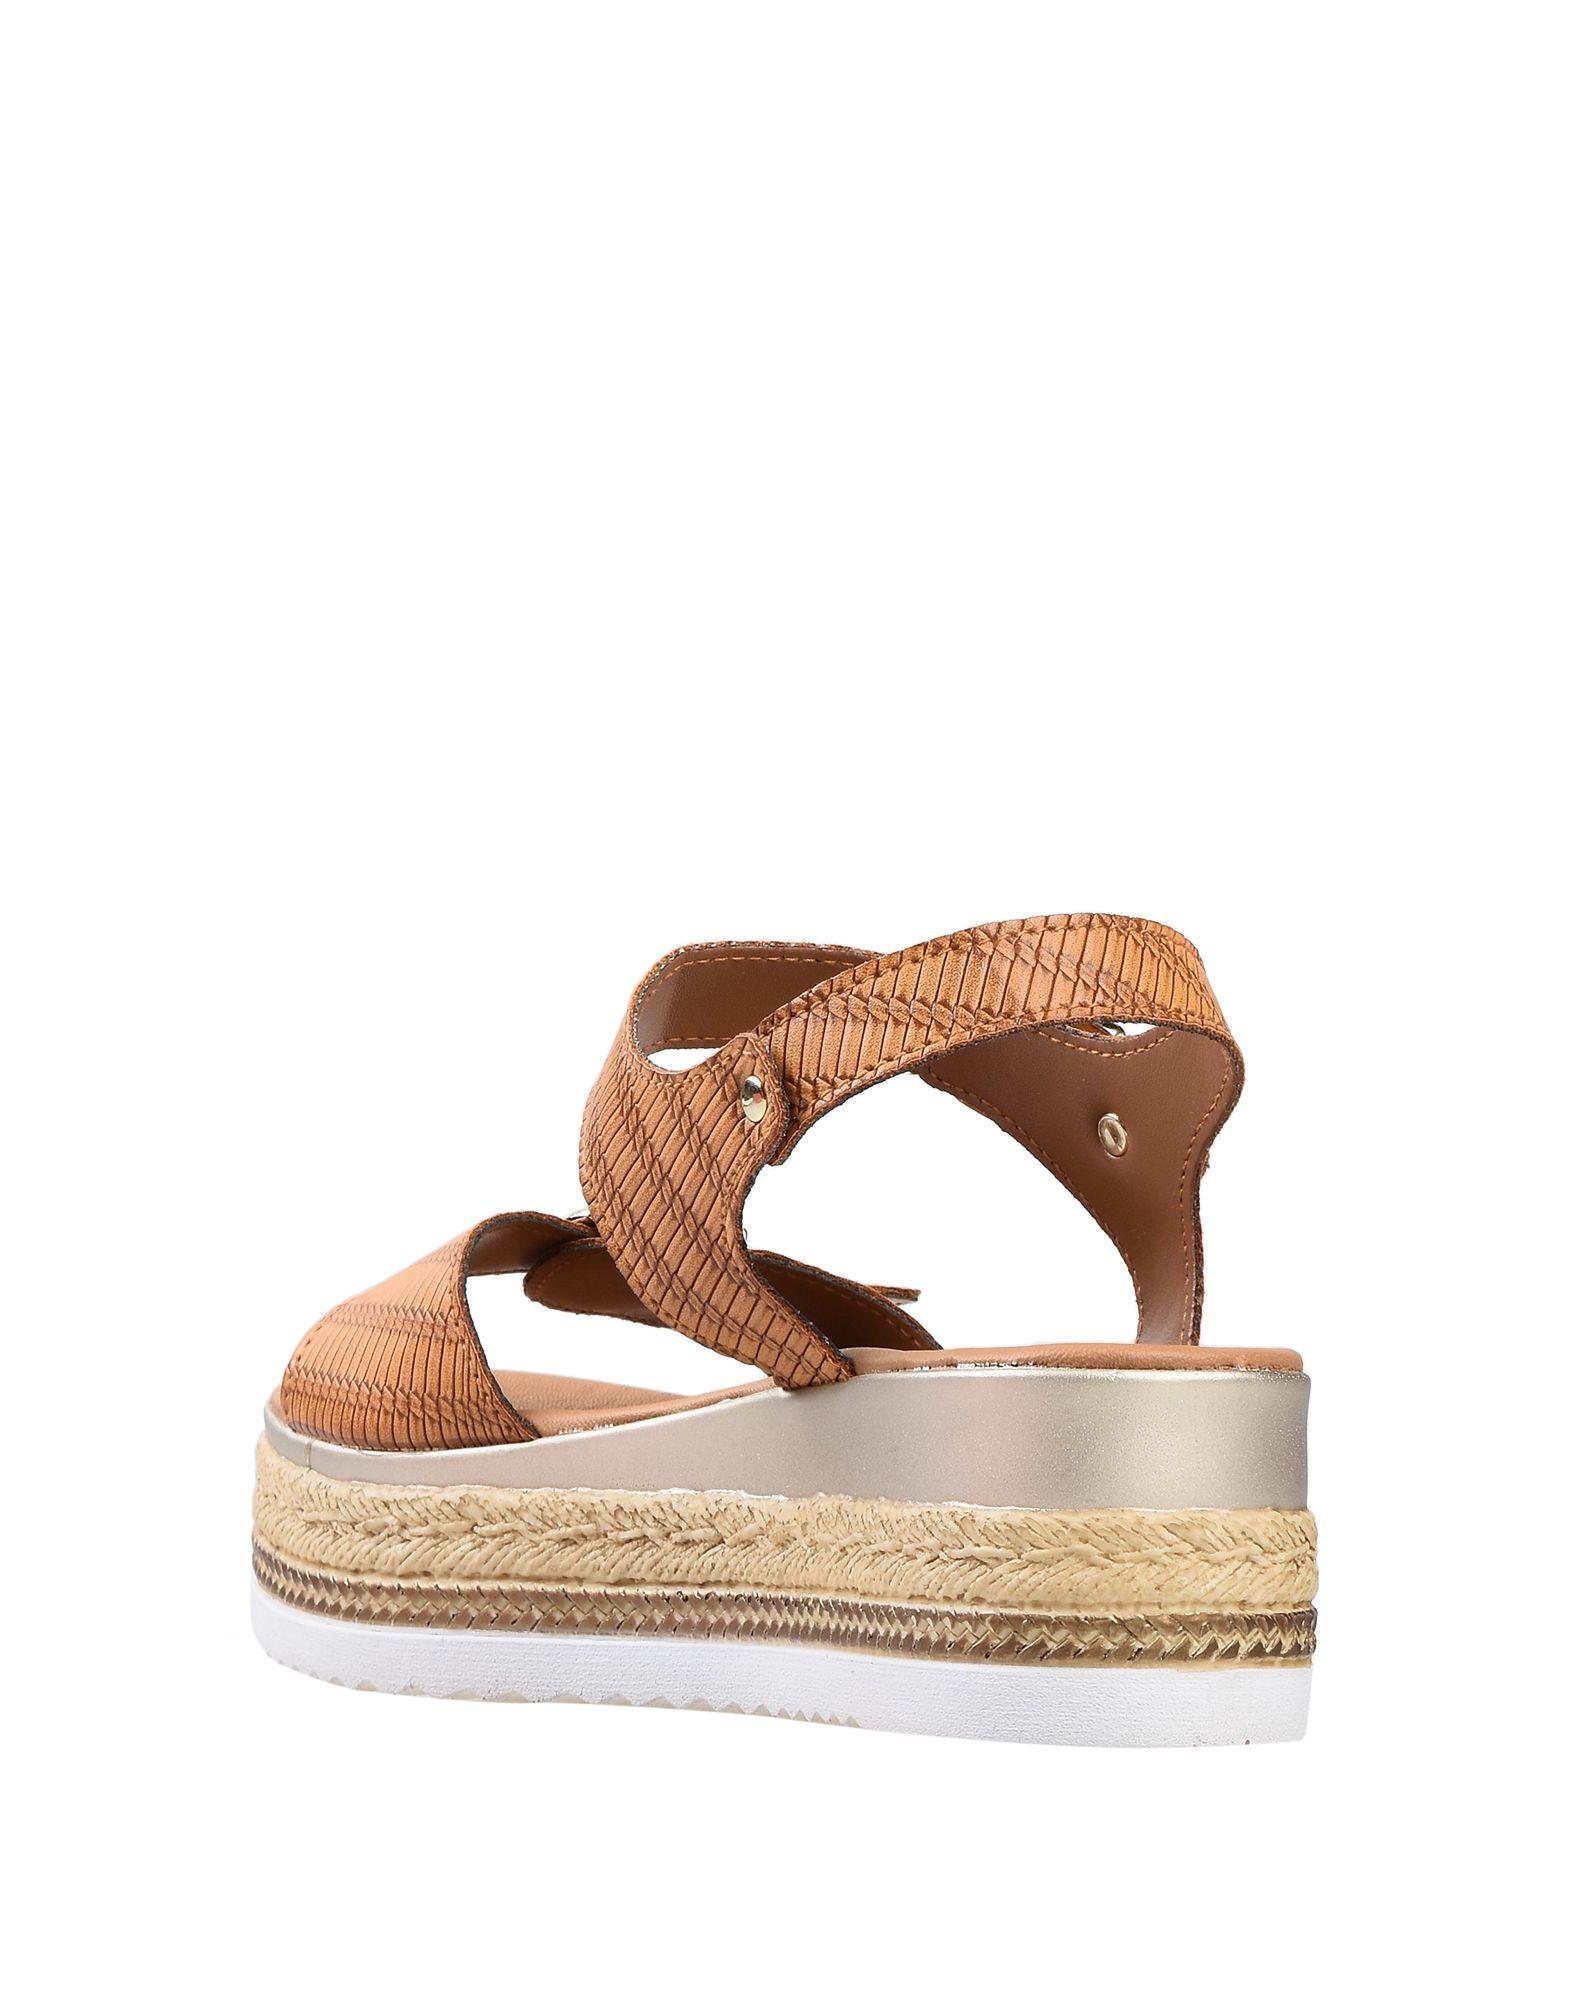 Sara Sandalen Damen  11624842EO 11624842EO 11624842EO Gute Qualität beliebte Schuhe e2ab01